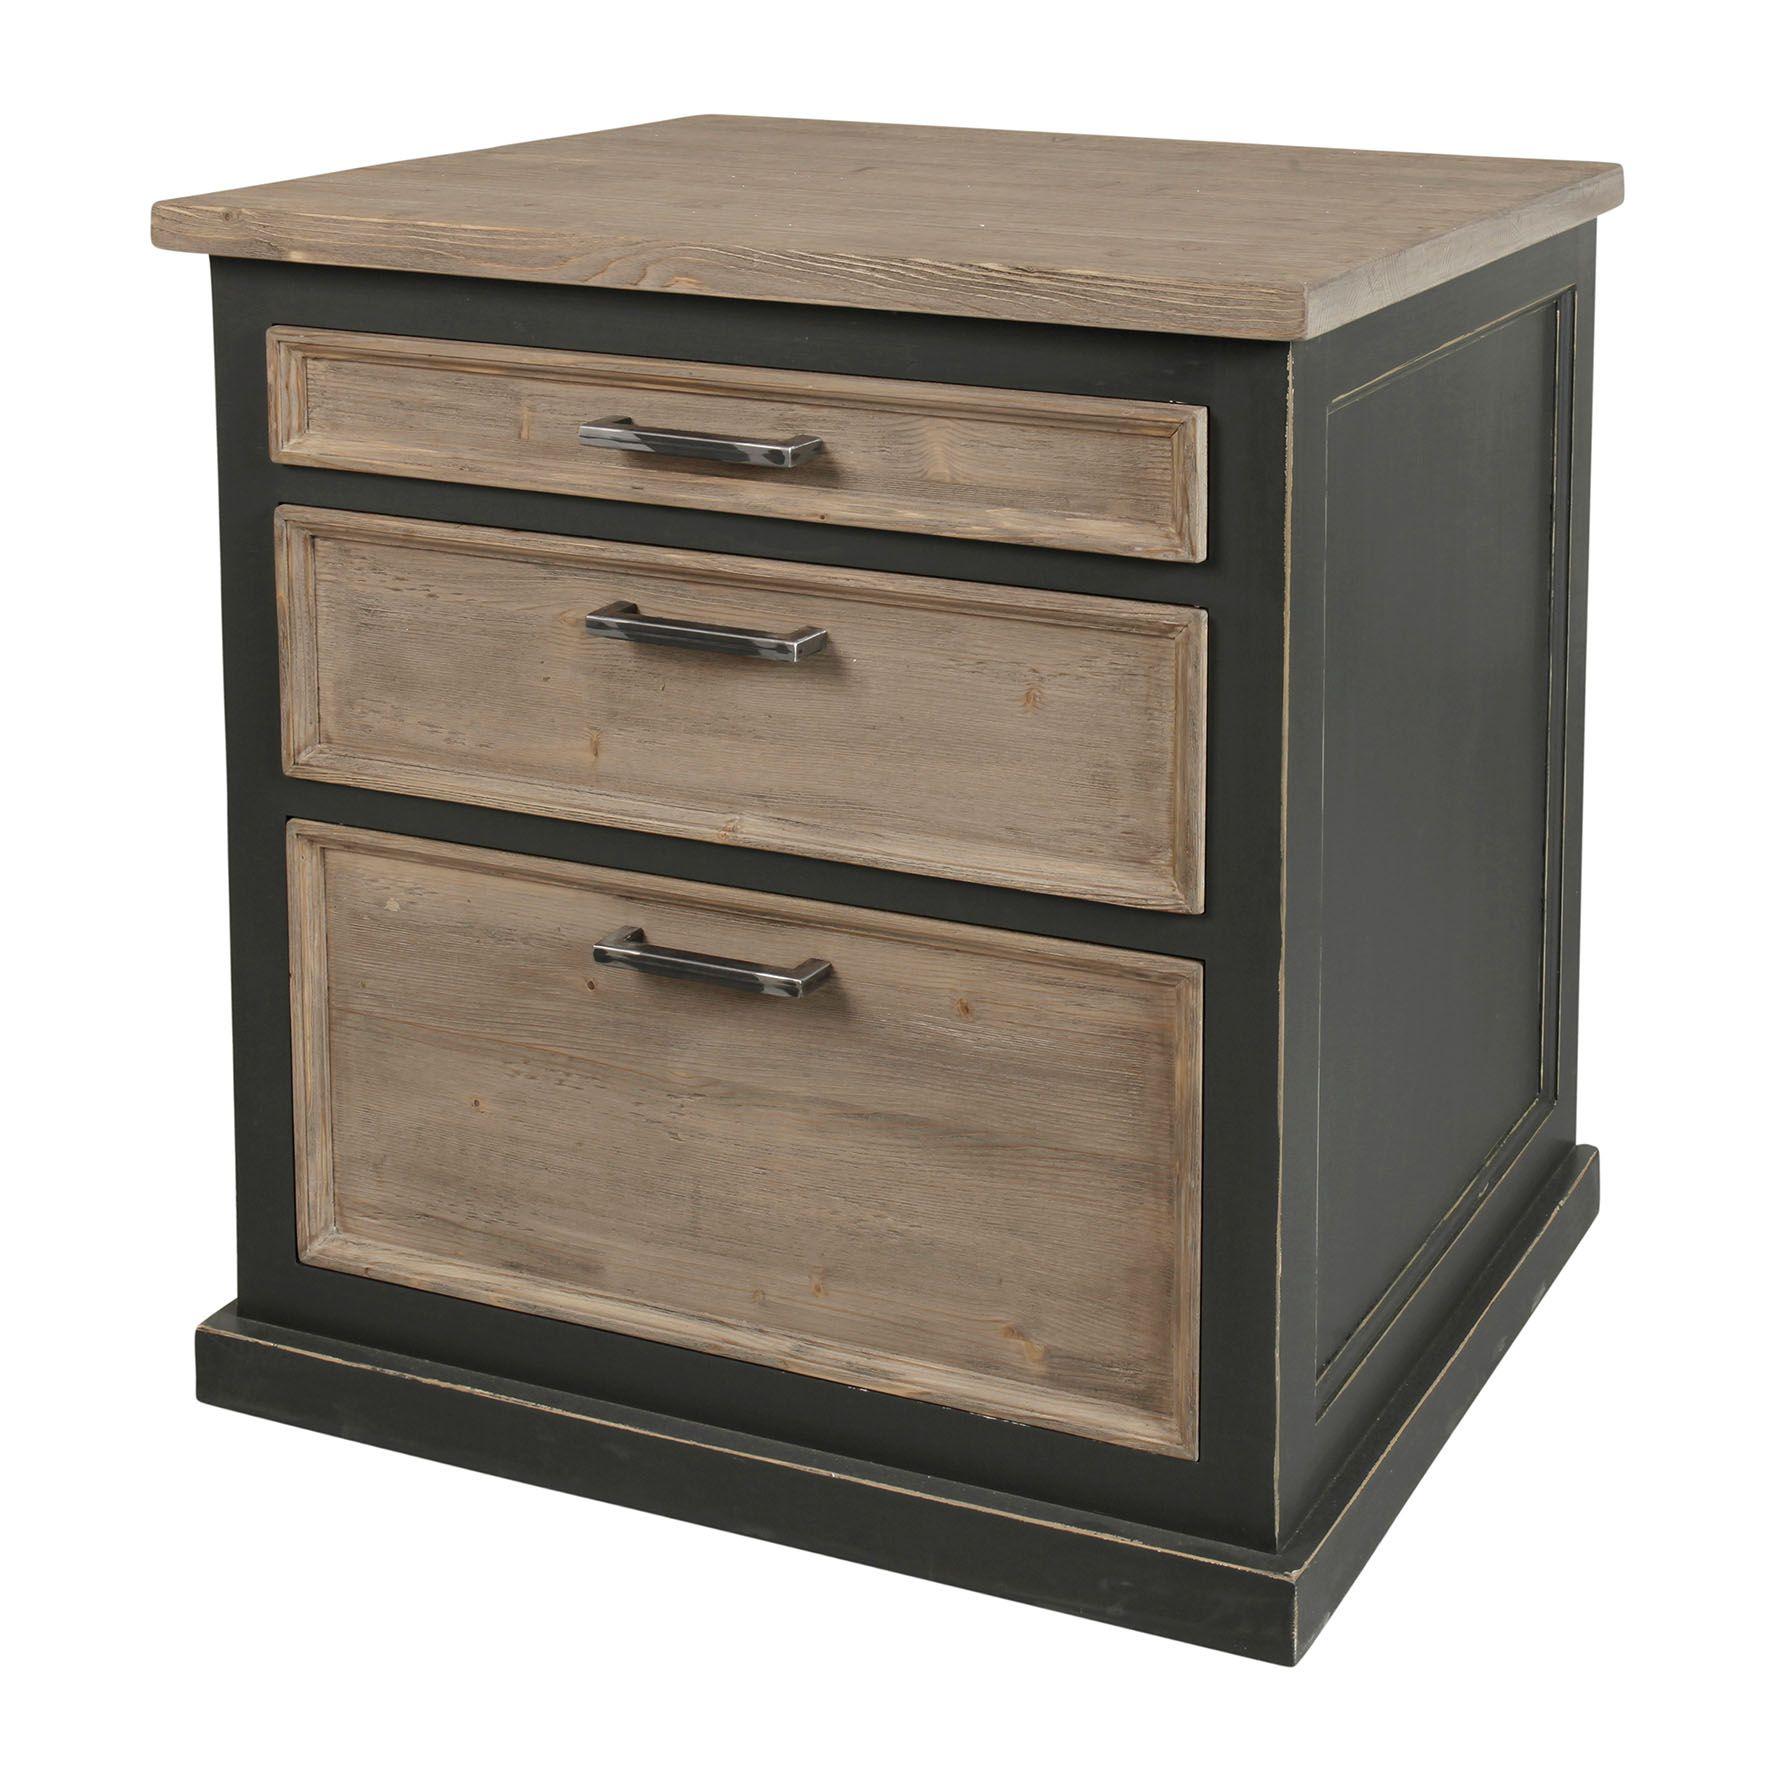 Meuble Bas Anthracithe 3 Tiroirs 90 80 65 Cm Decor Home Decor Filing Cabinet